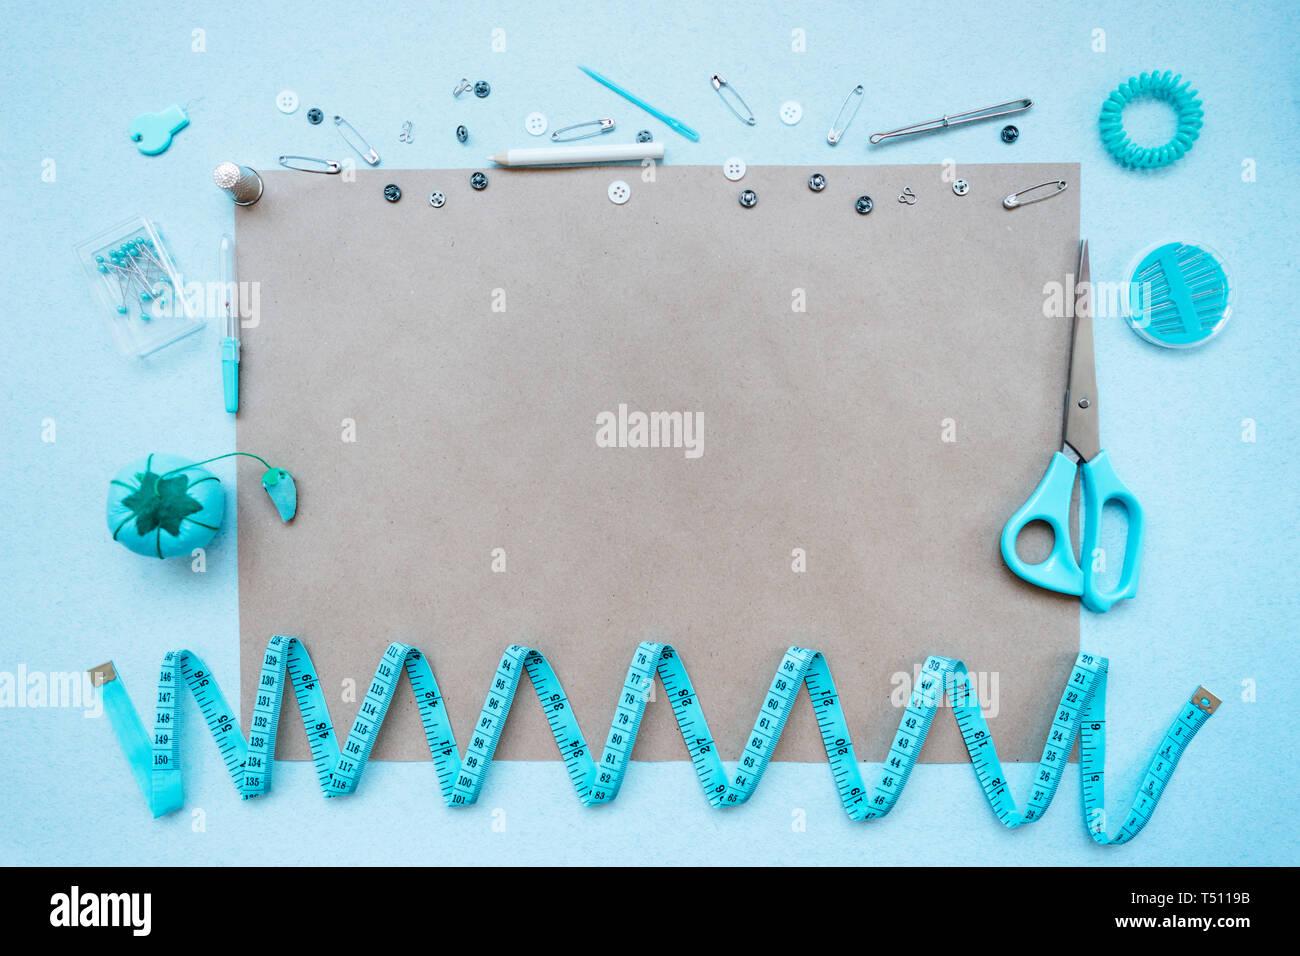 Kit de costura sobre un fondo azul. Vista desde arriba Foto de stock